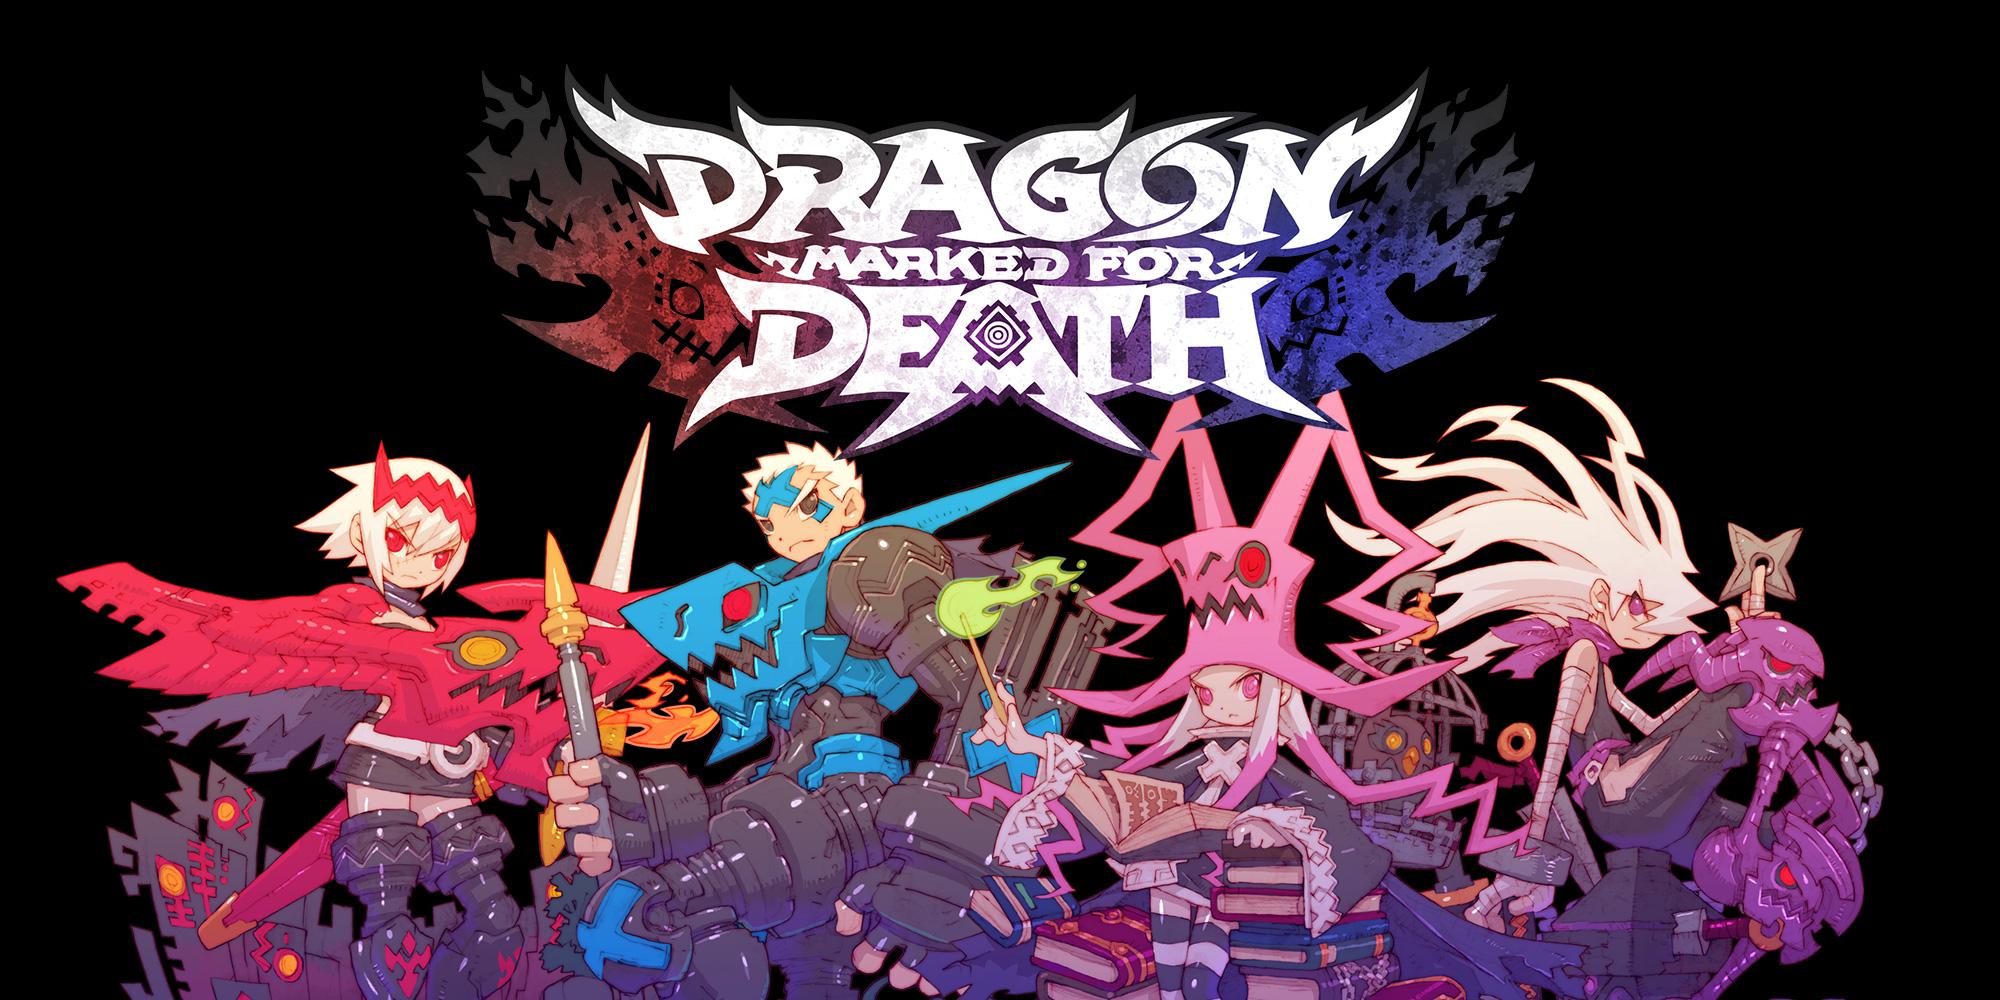 Resultado de imagem para DRAGON: MARKED FOR DEATH